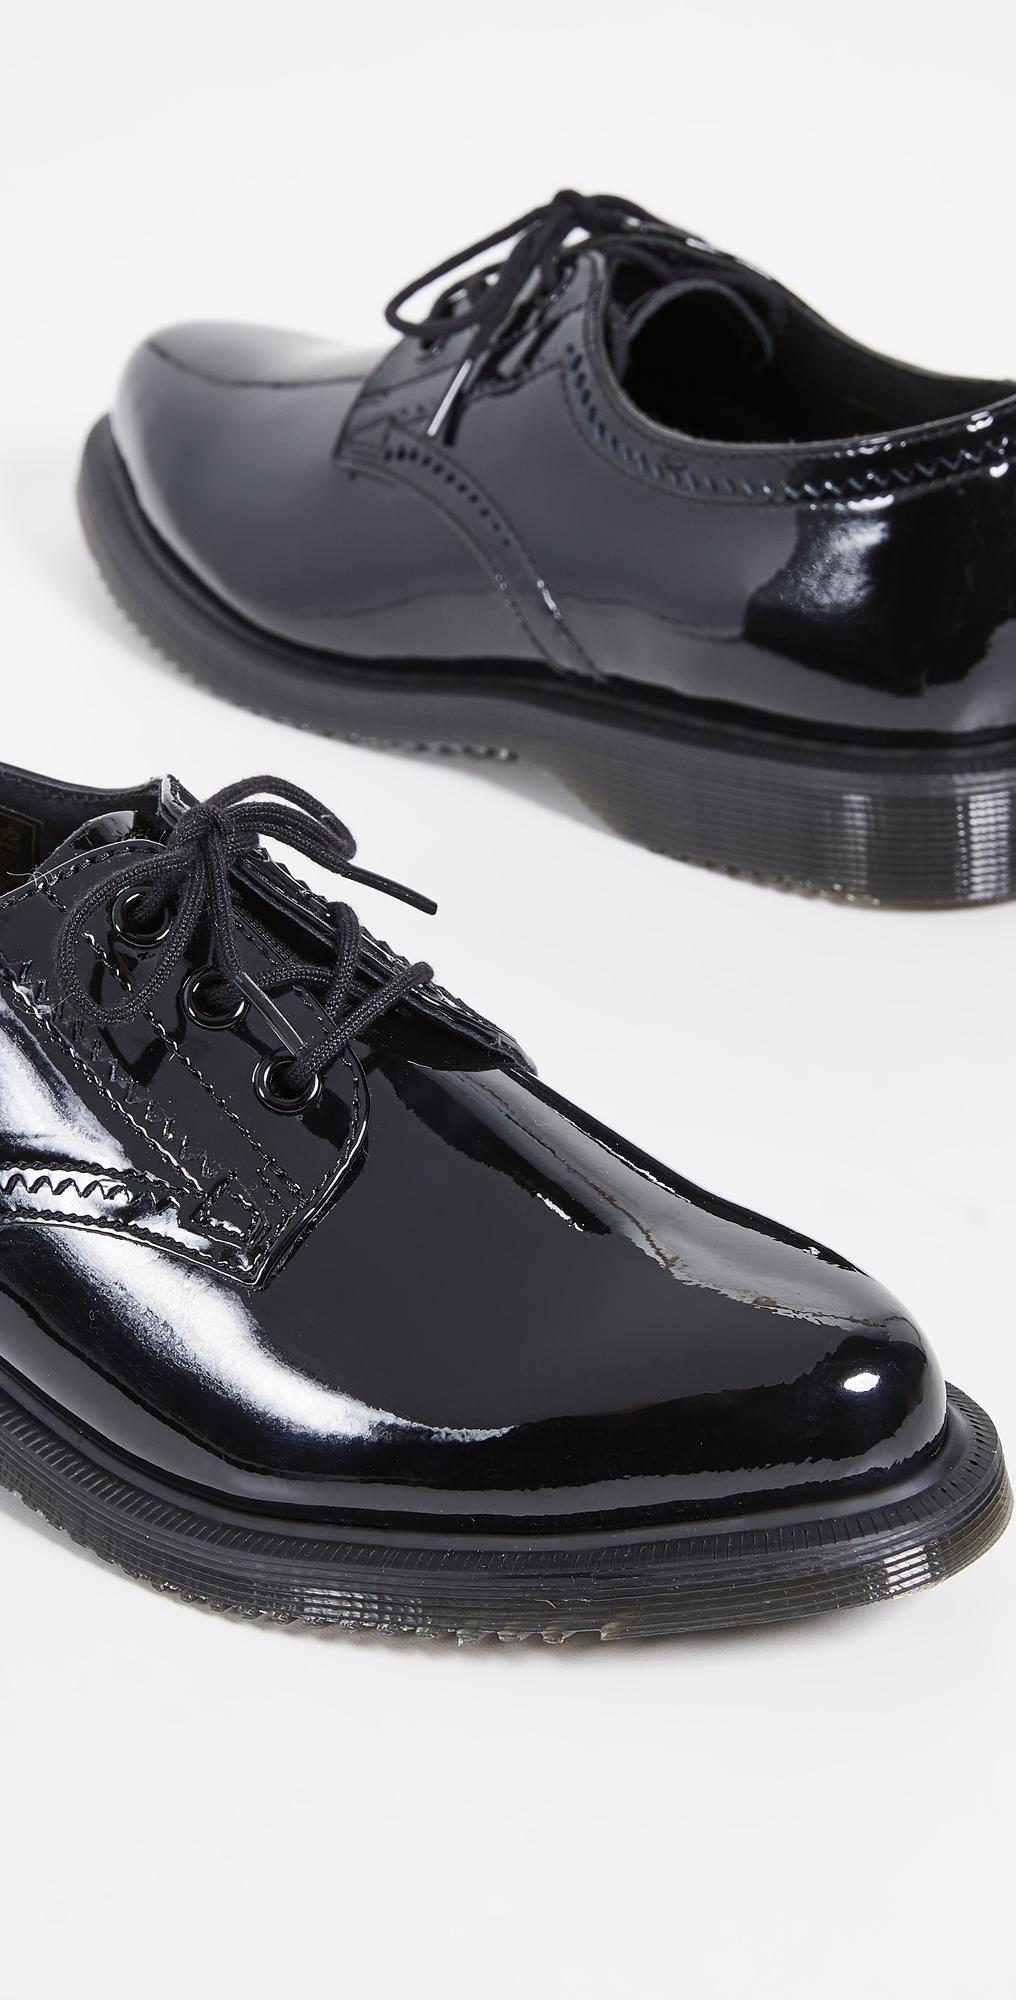 Dr. Martens Trulia 3 Eye Shoes